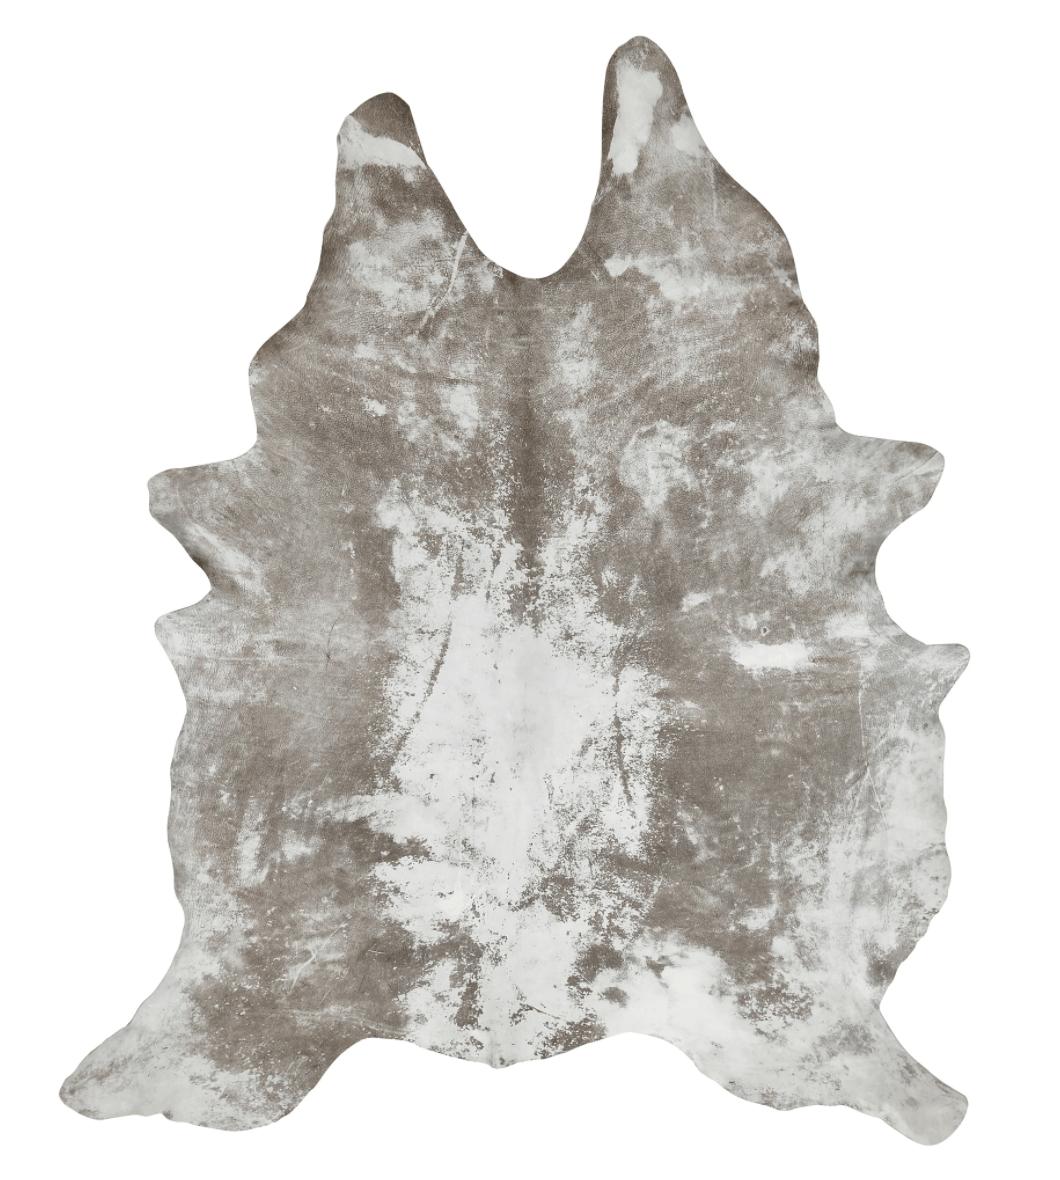 ikea-rugs-2020